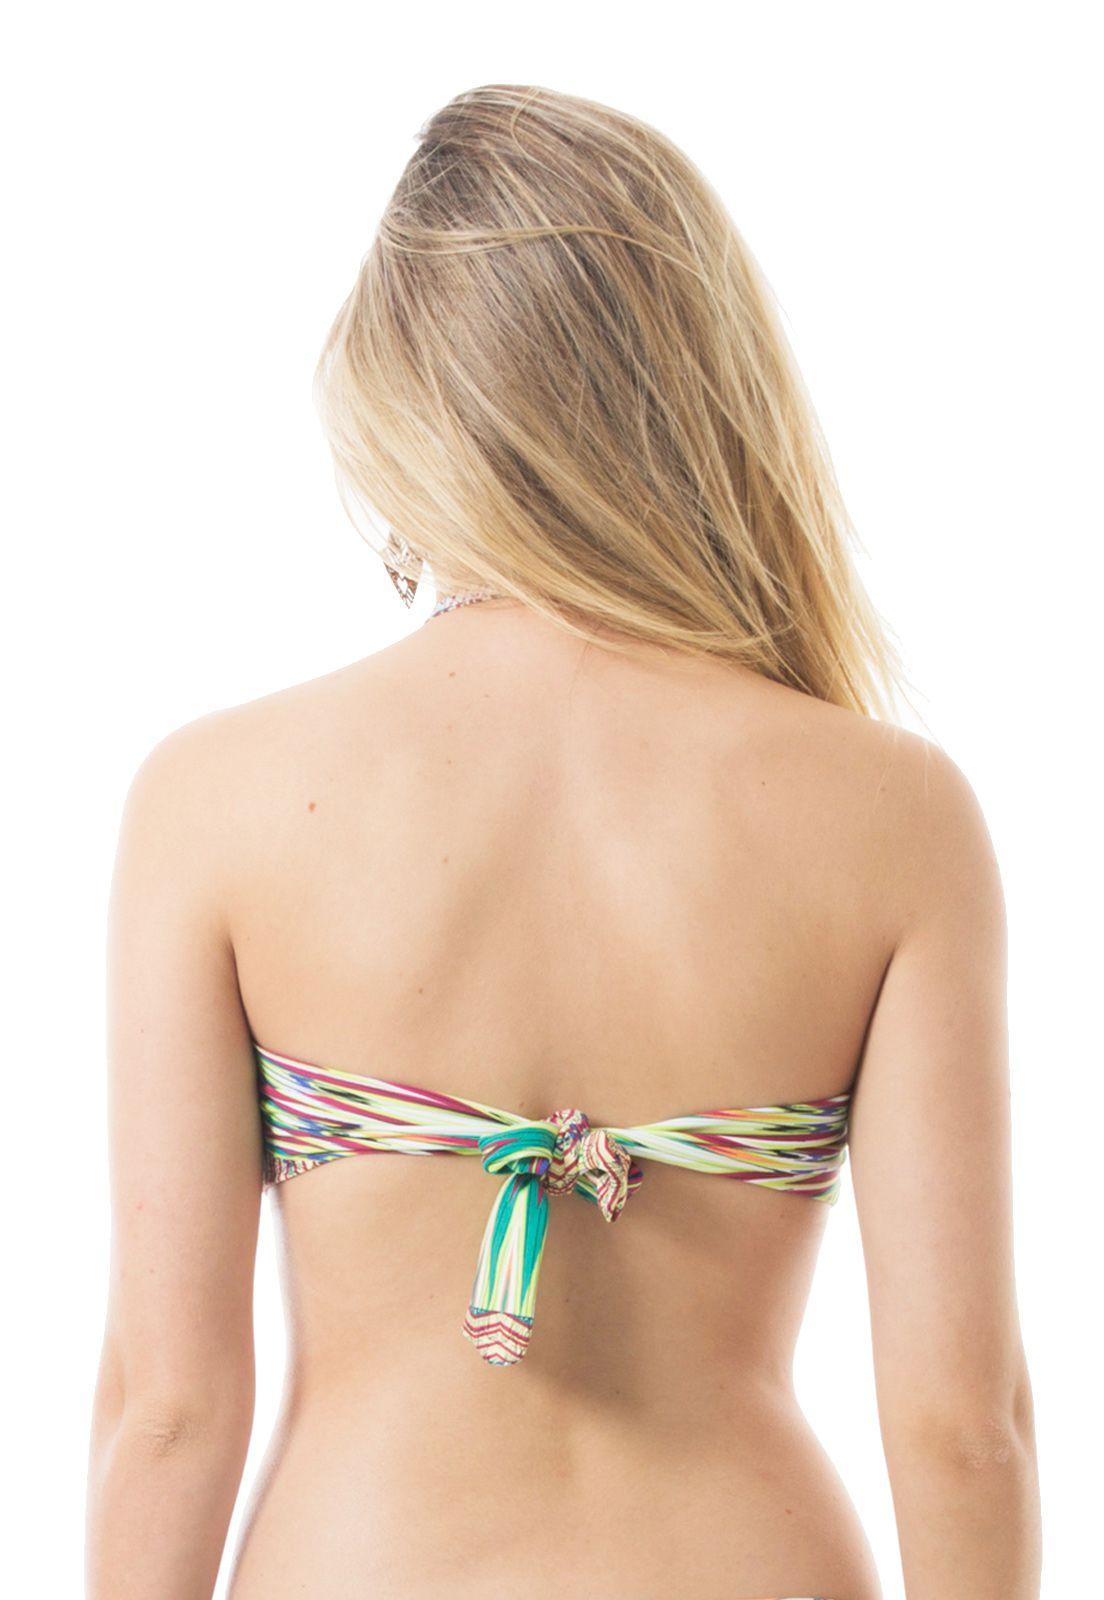 Biquíni Top Bandeau Flavia Donadio Beachwear Tahiti-1 Multicolorido